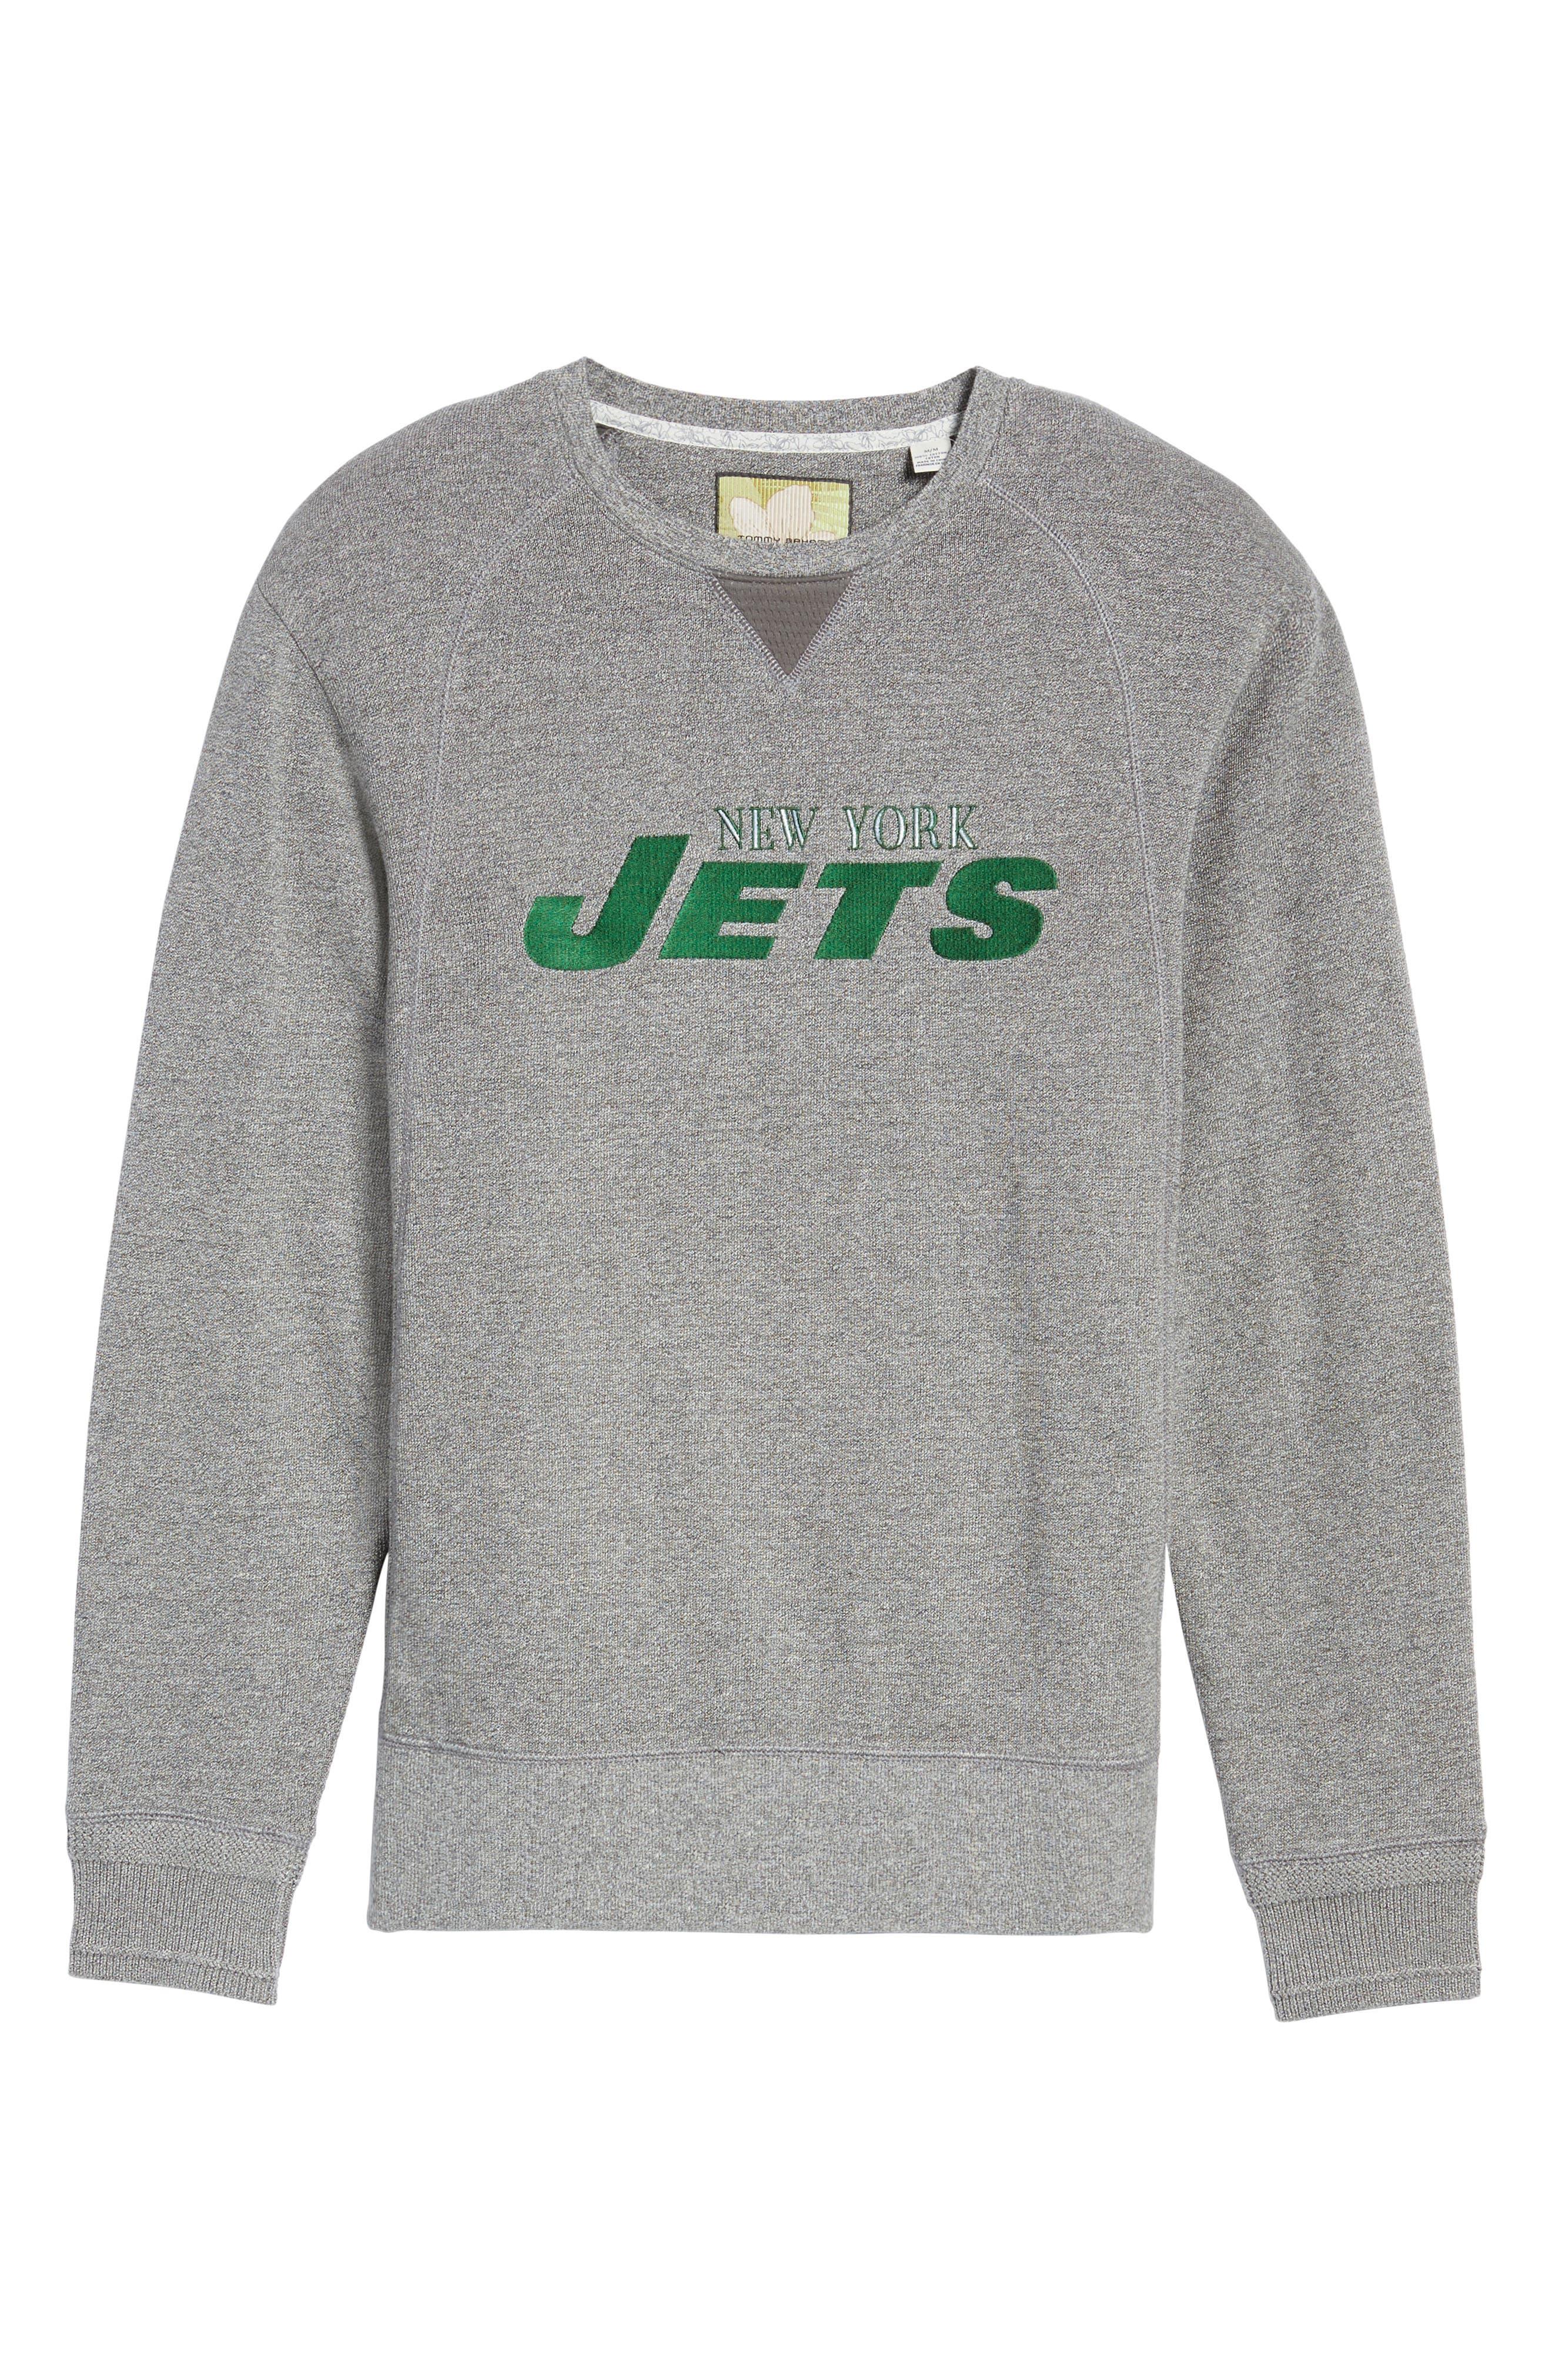 NFL Stitch of Liberty Embroidered Crewneck Sweatshirt,                             Alternate thumbnail 169, color,